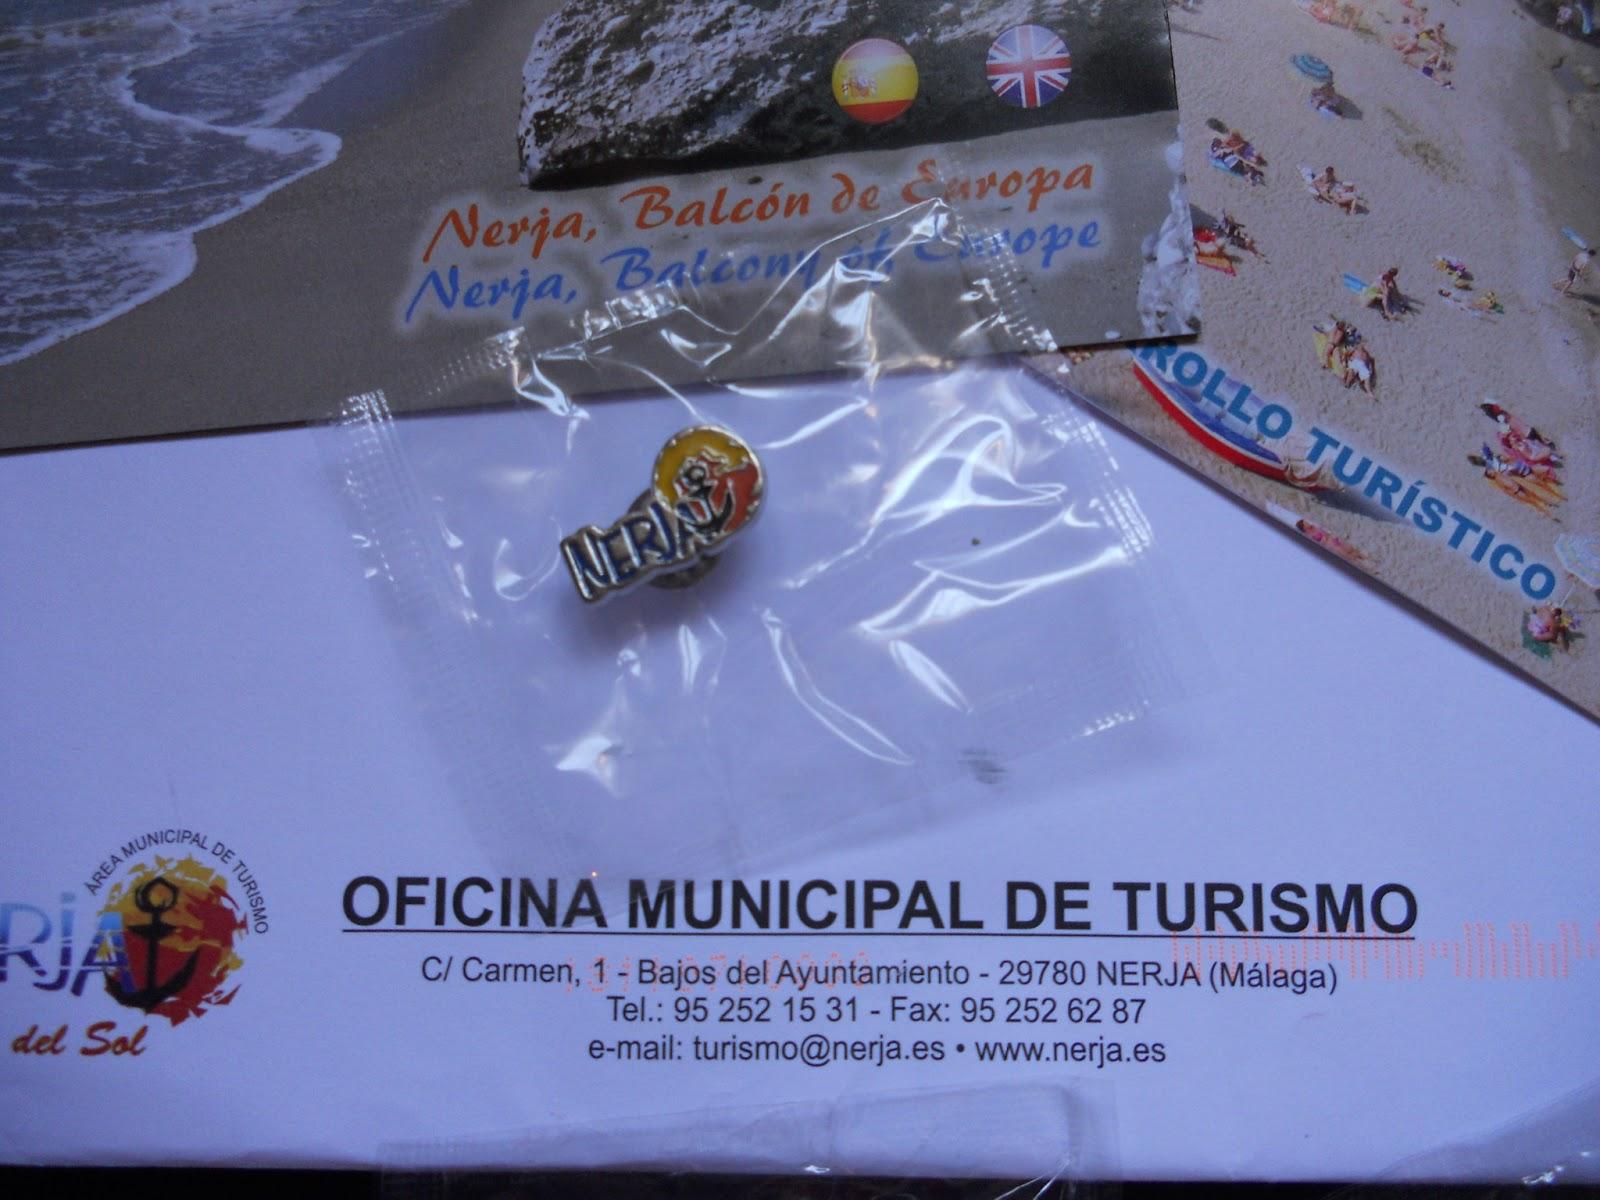 Pinspalomo pueblos de malaga andalucia for Oficina turismo nerja